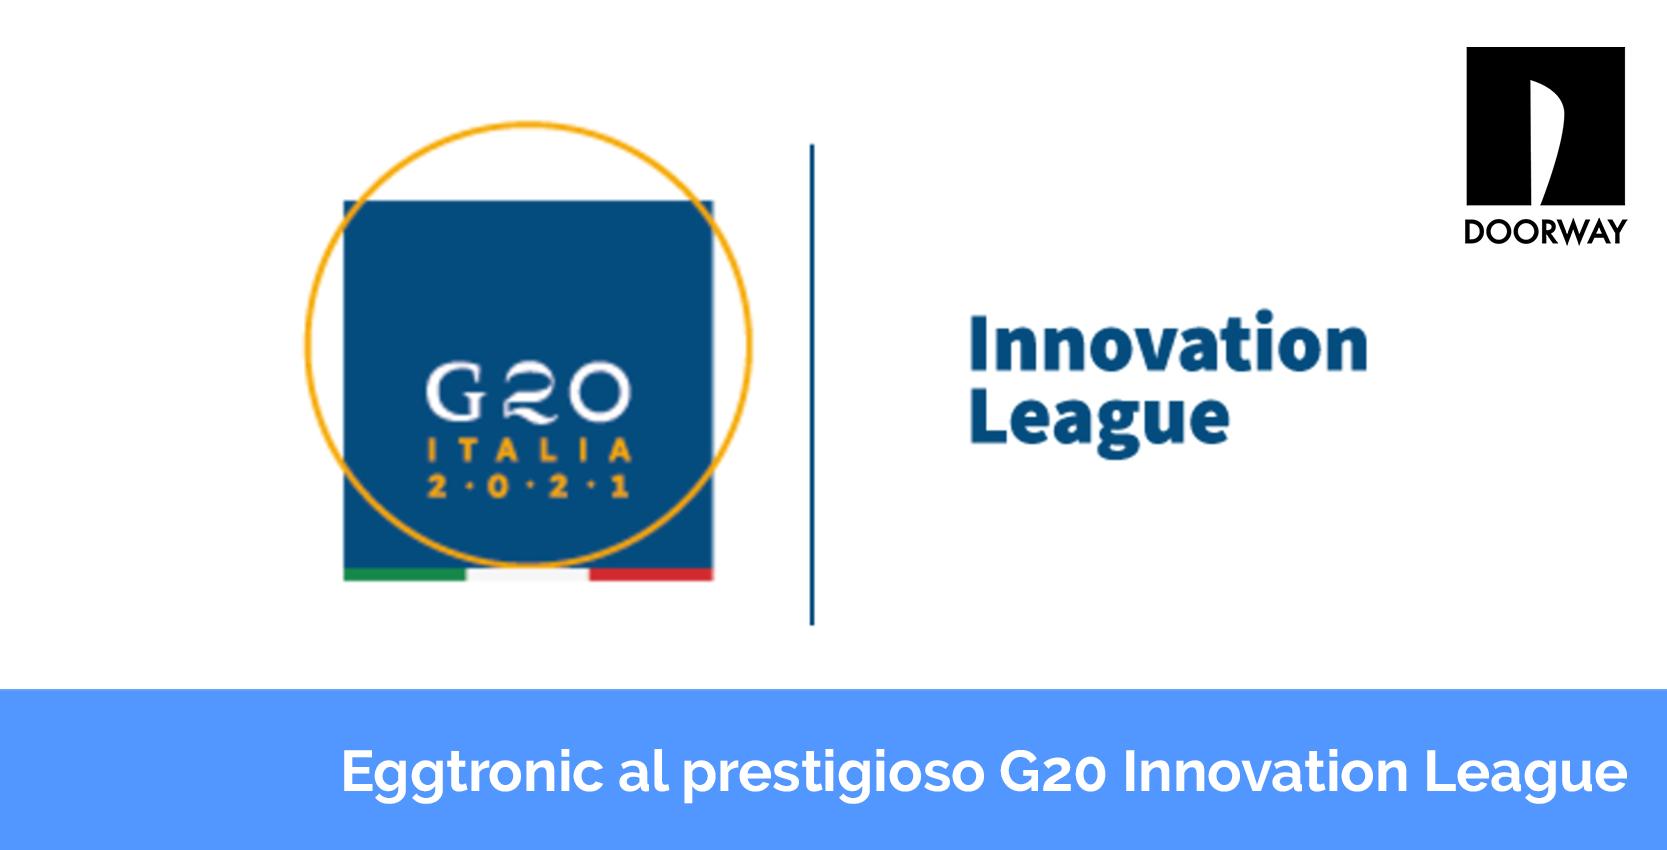 Eggtronic al prestigioso G20 innovation League